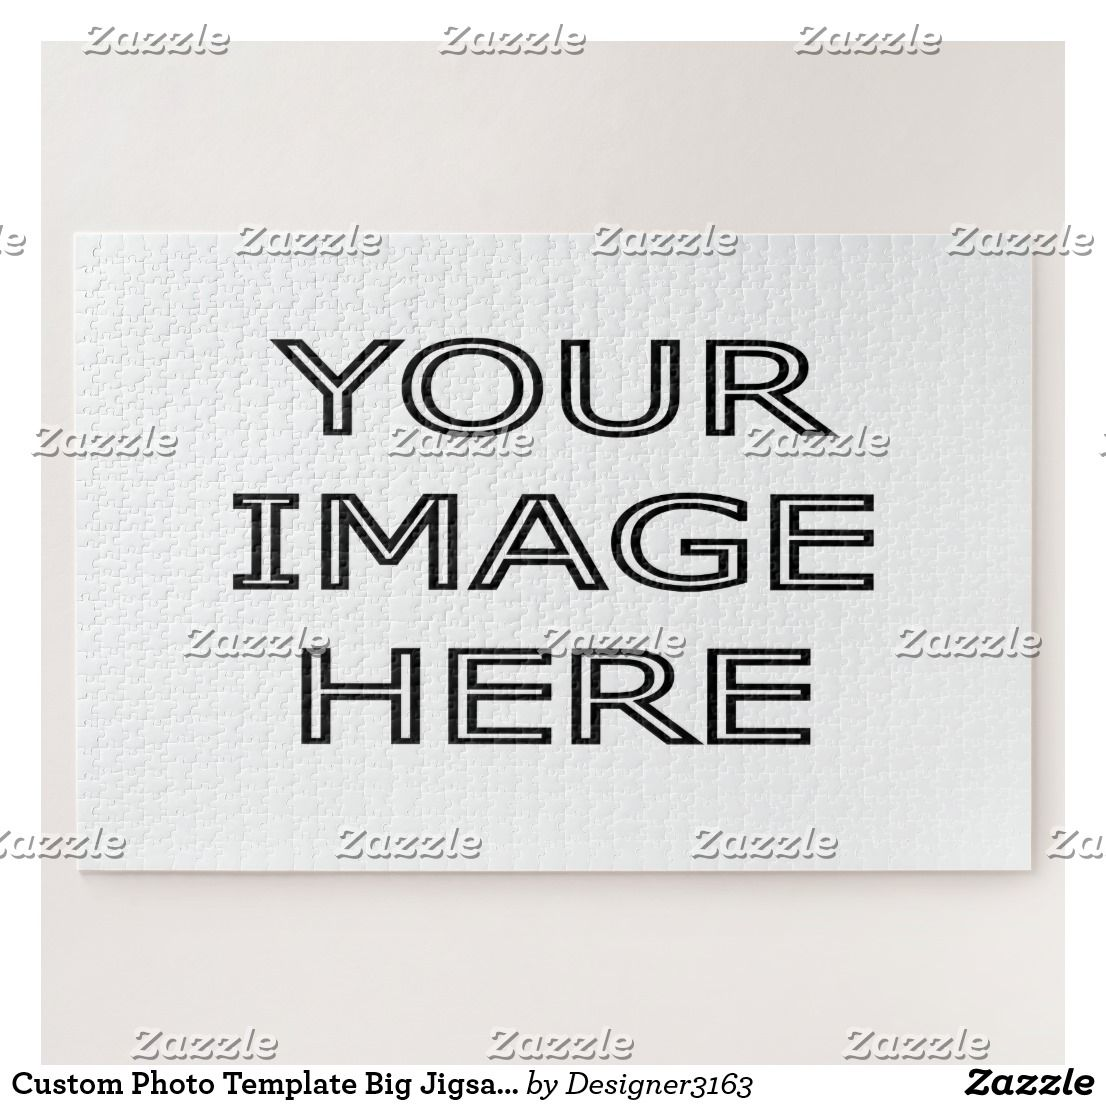 Custom Photo Template Big Jigsaw Puzzle | Custom photo